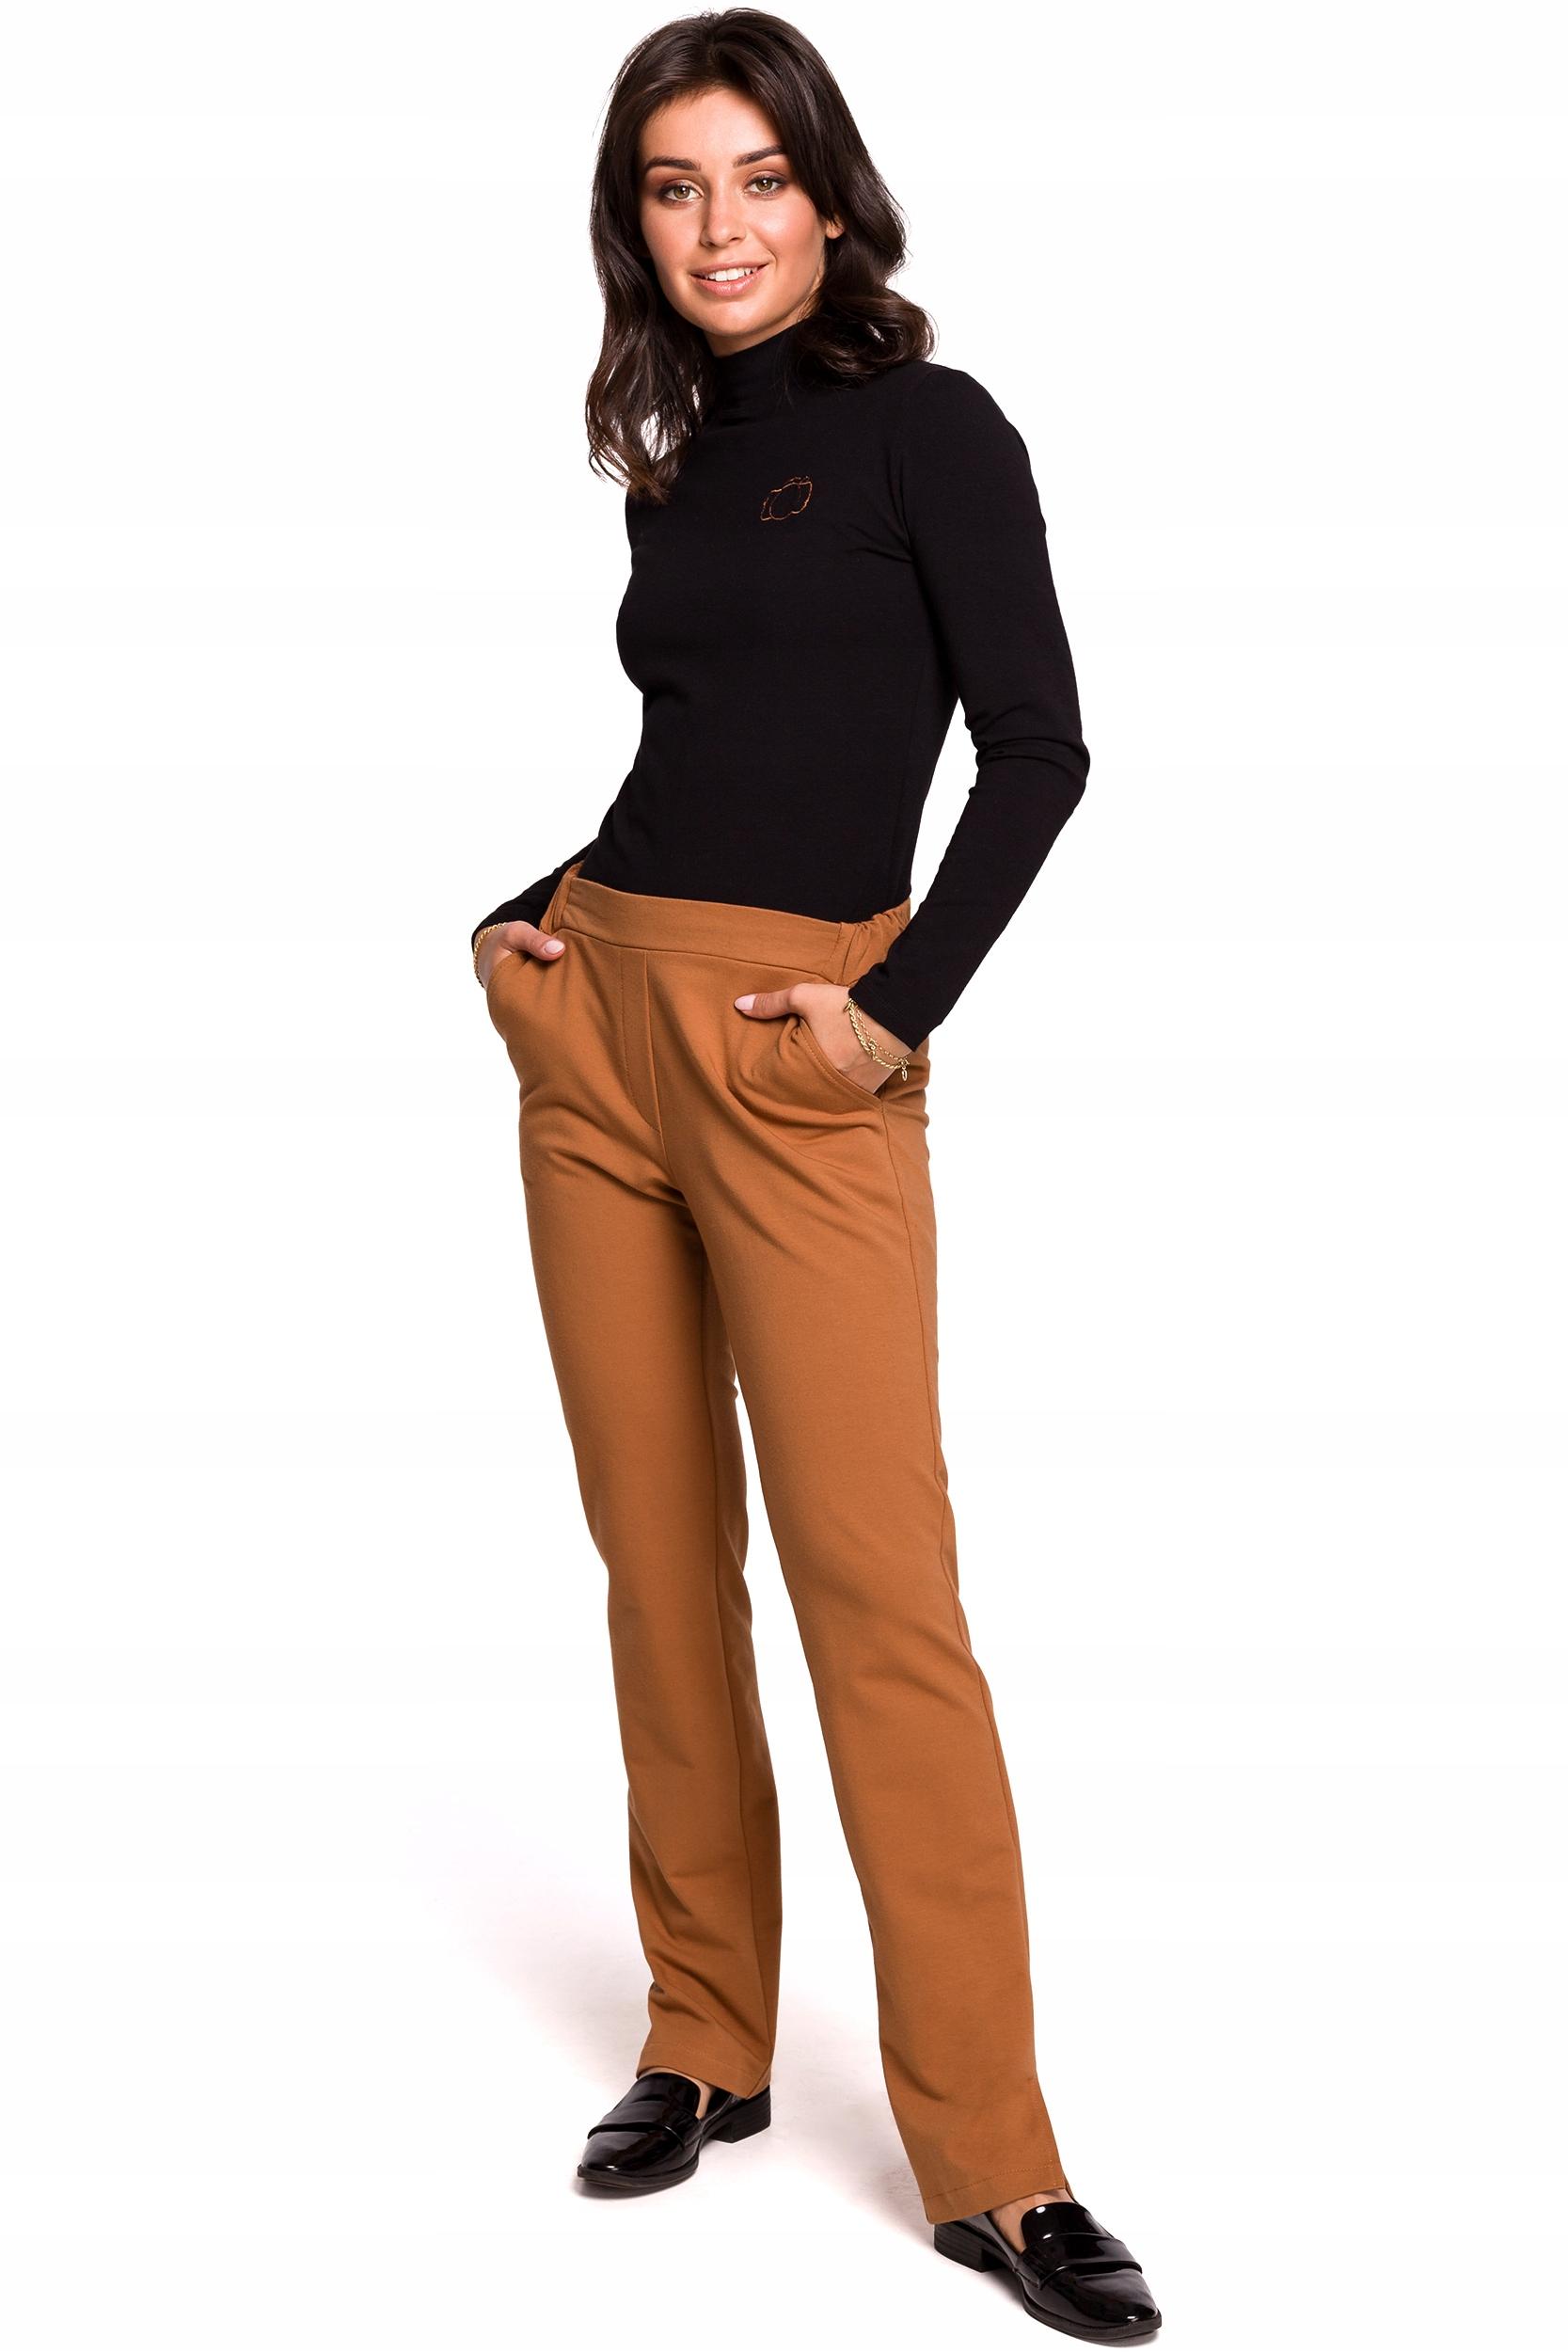 B124 Spodnie z rozporkami po bokach - 42 | XL